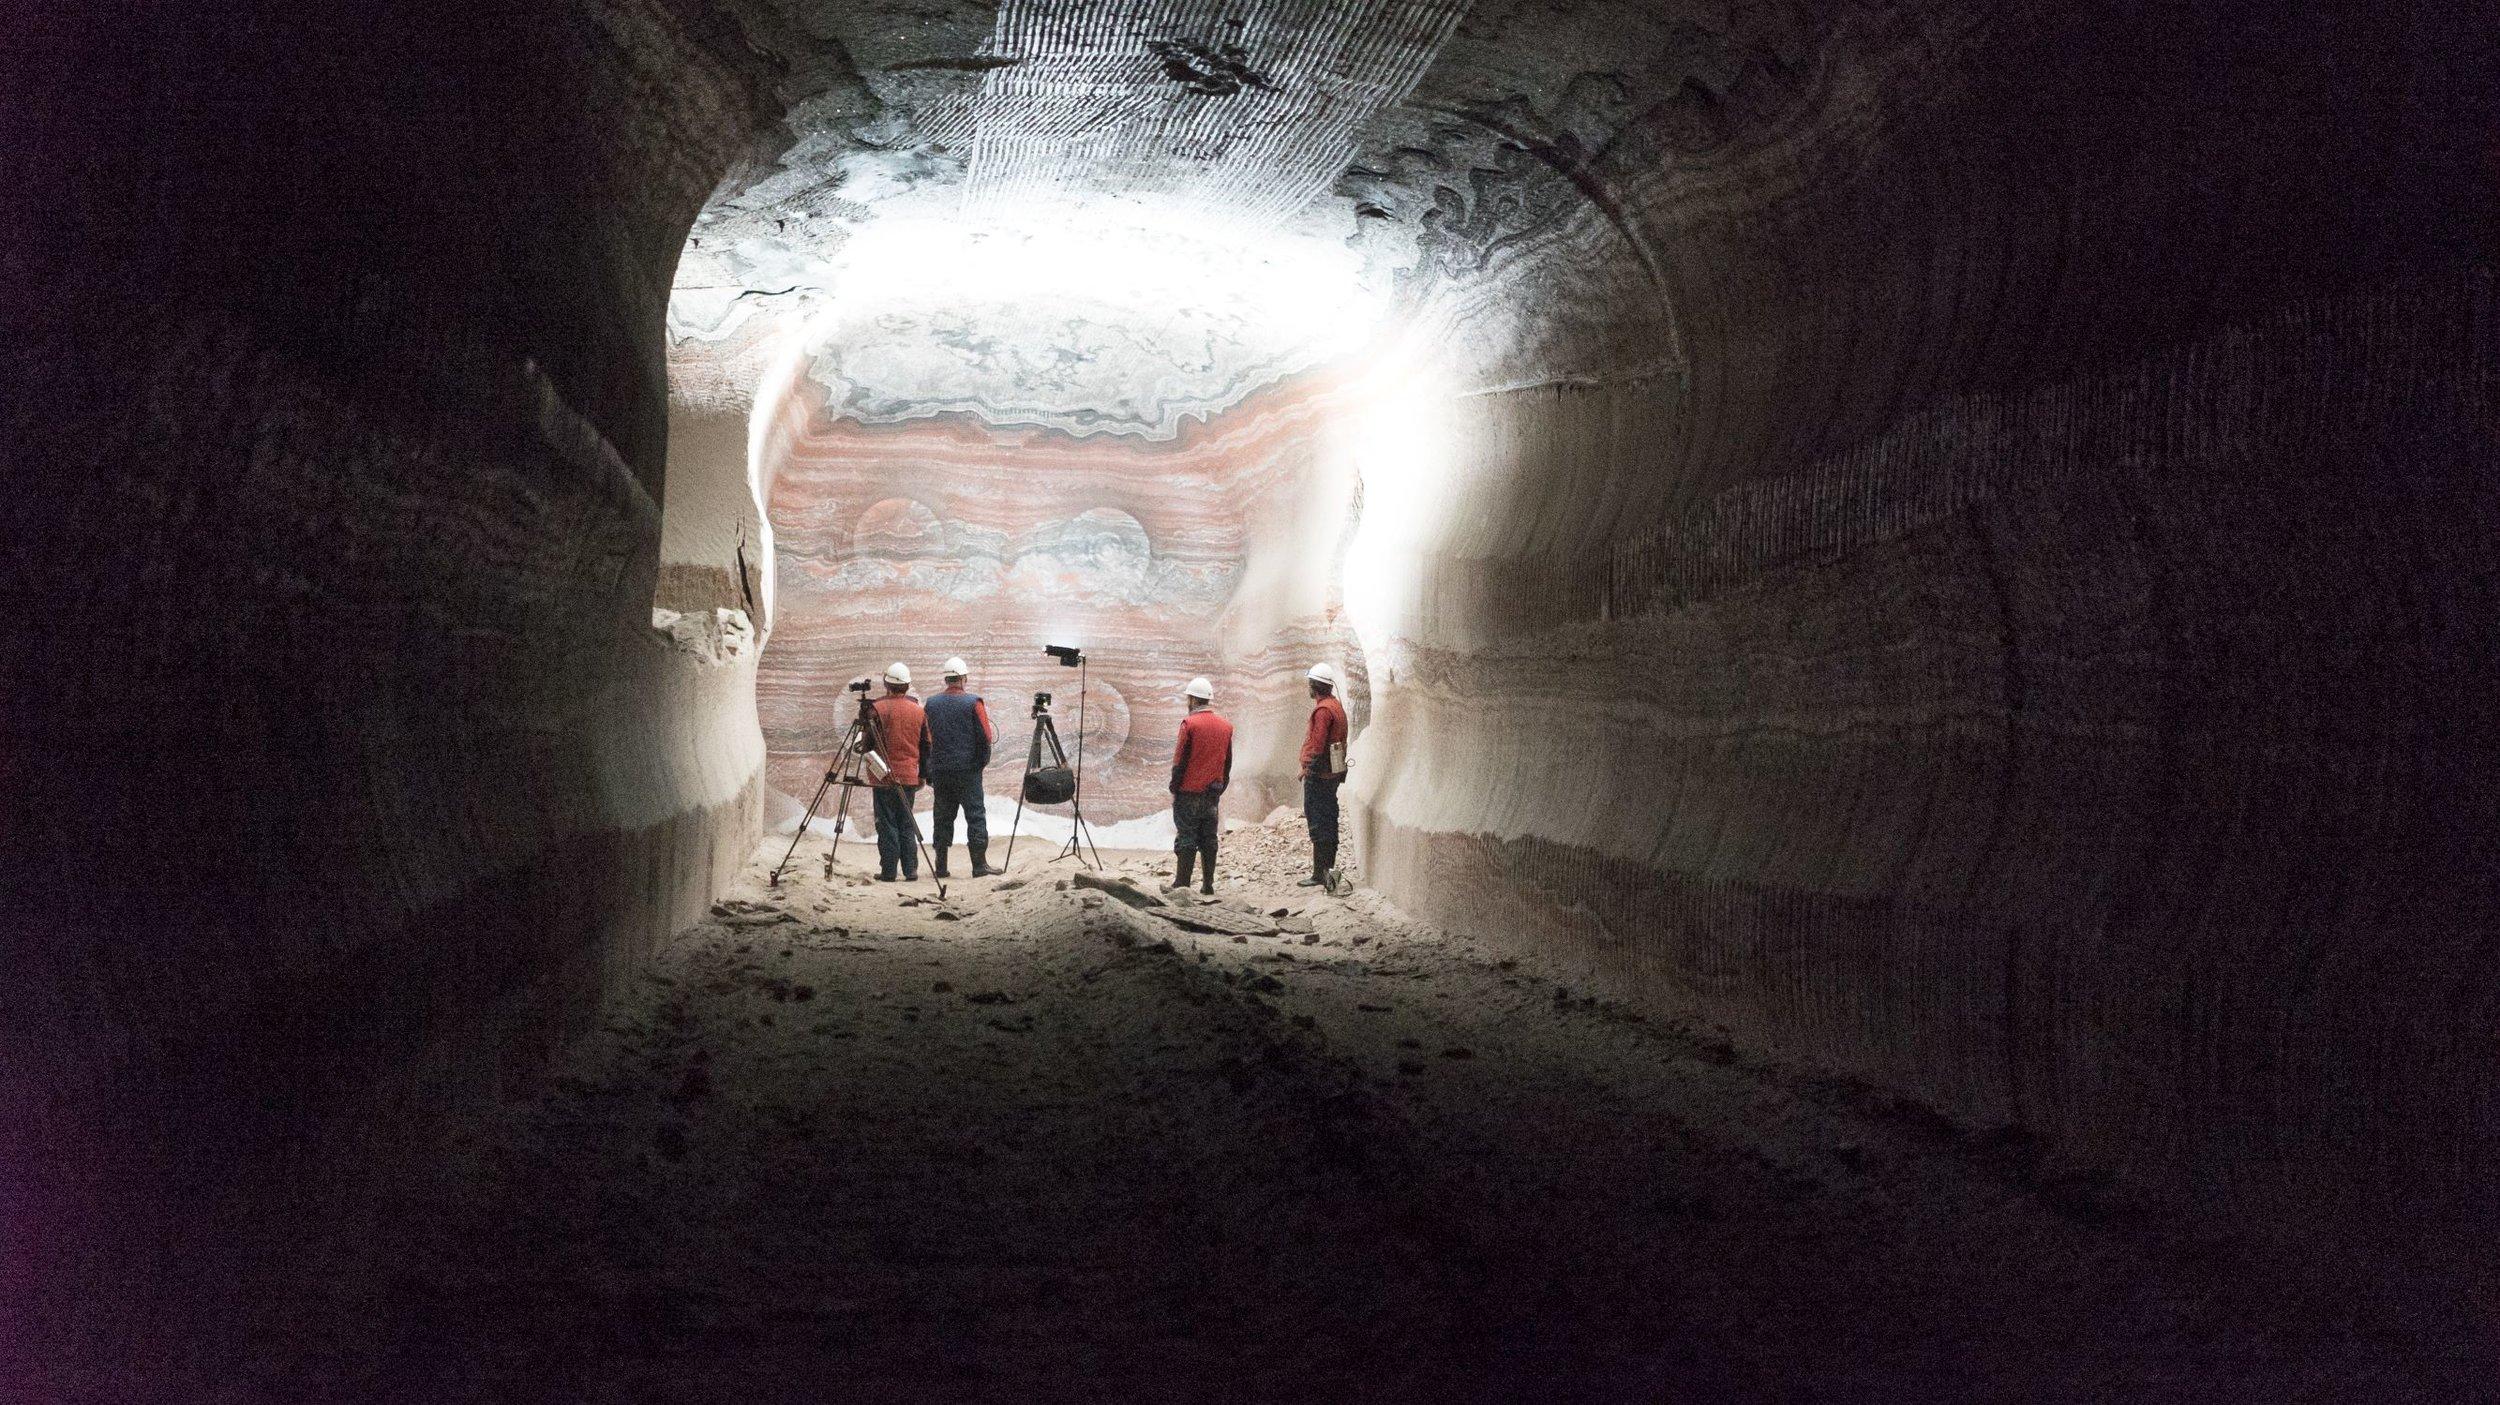 Miniere di potassio a Beresniki negli Urali russi